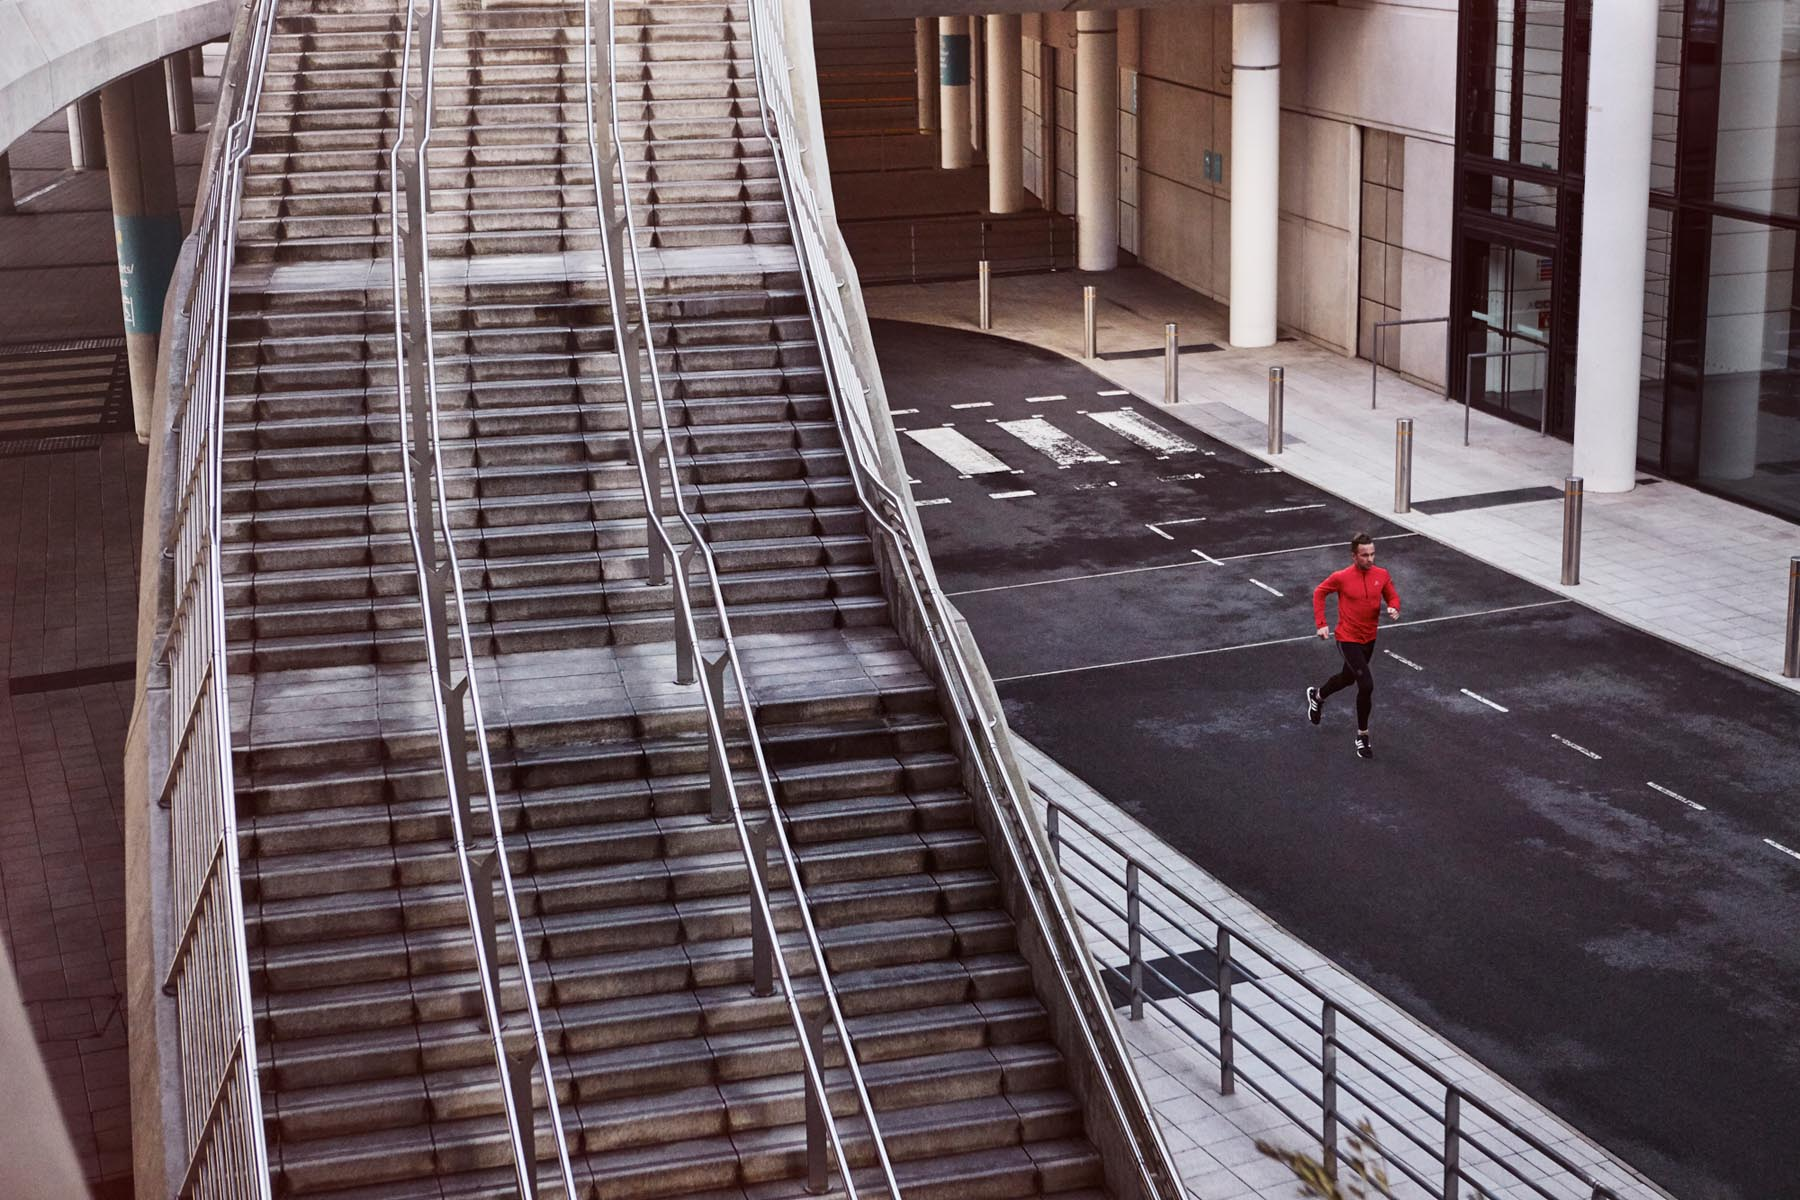 Duncan Nicholls City Staircase Jogger